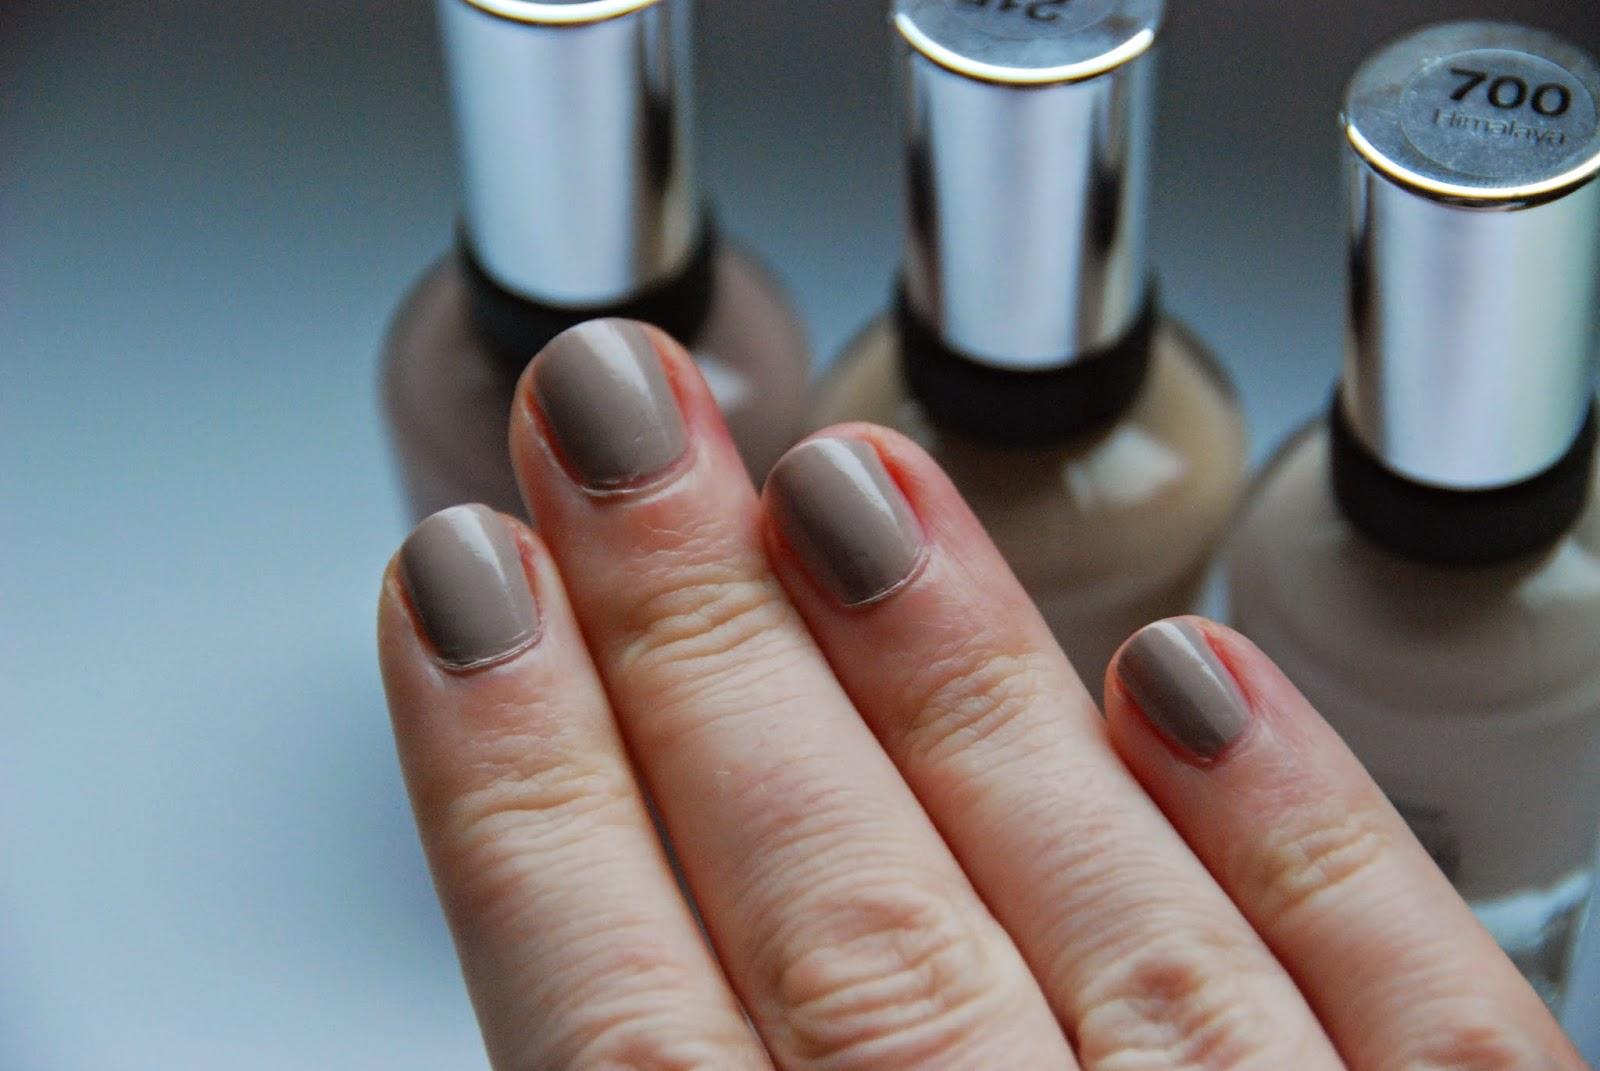 beautyglace review sally hansen nagellack neuheiten. Black Bedroom Furniture Sets. Home Design Ideas